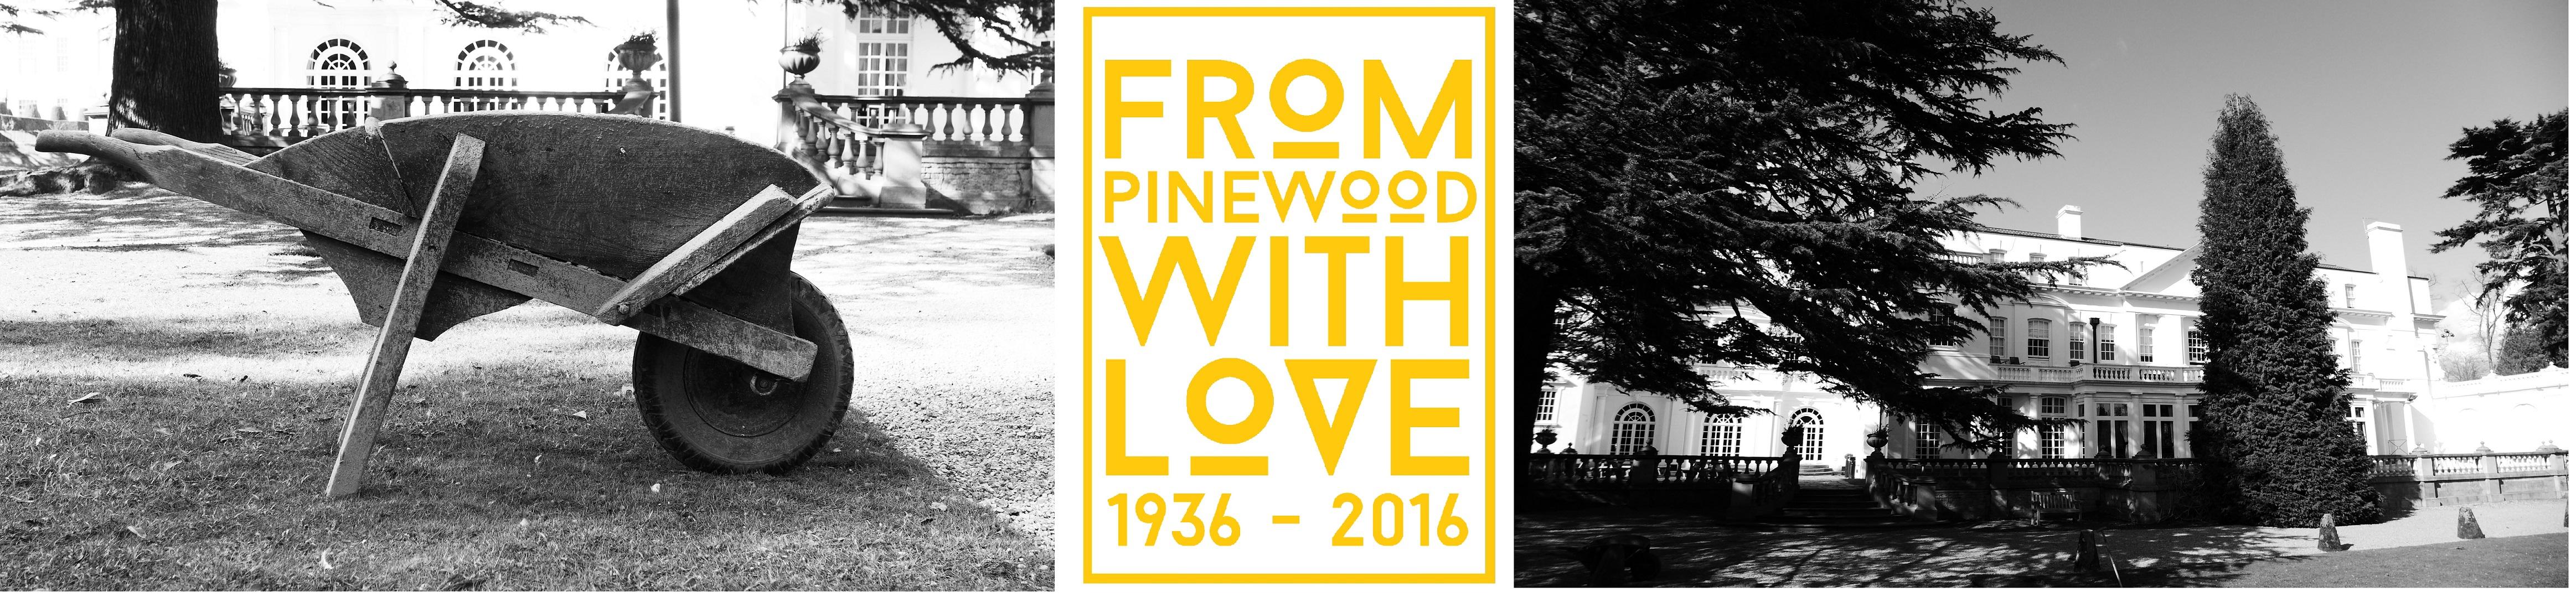 pinewood-montage-3